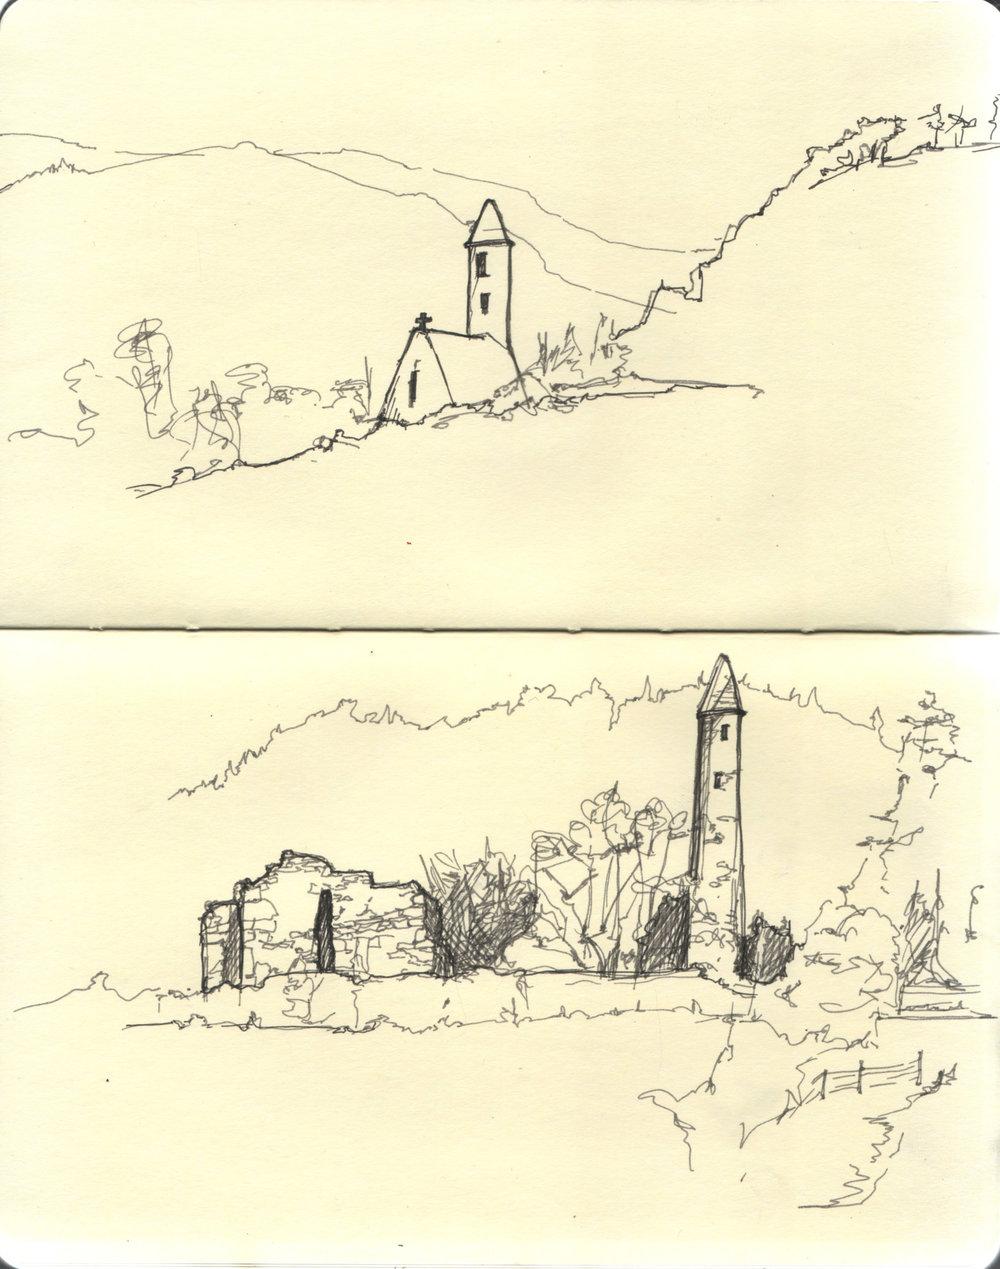 11.04.18.ireland.sketch.glendalaugh.2.jpg